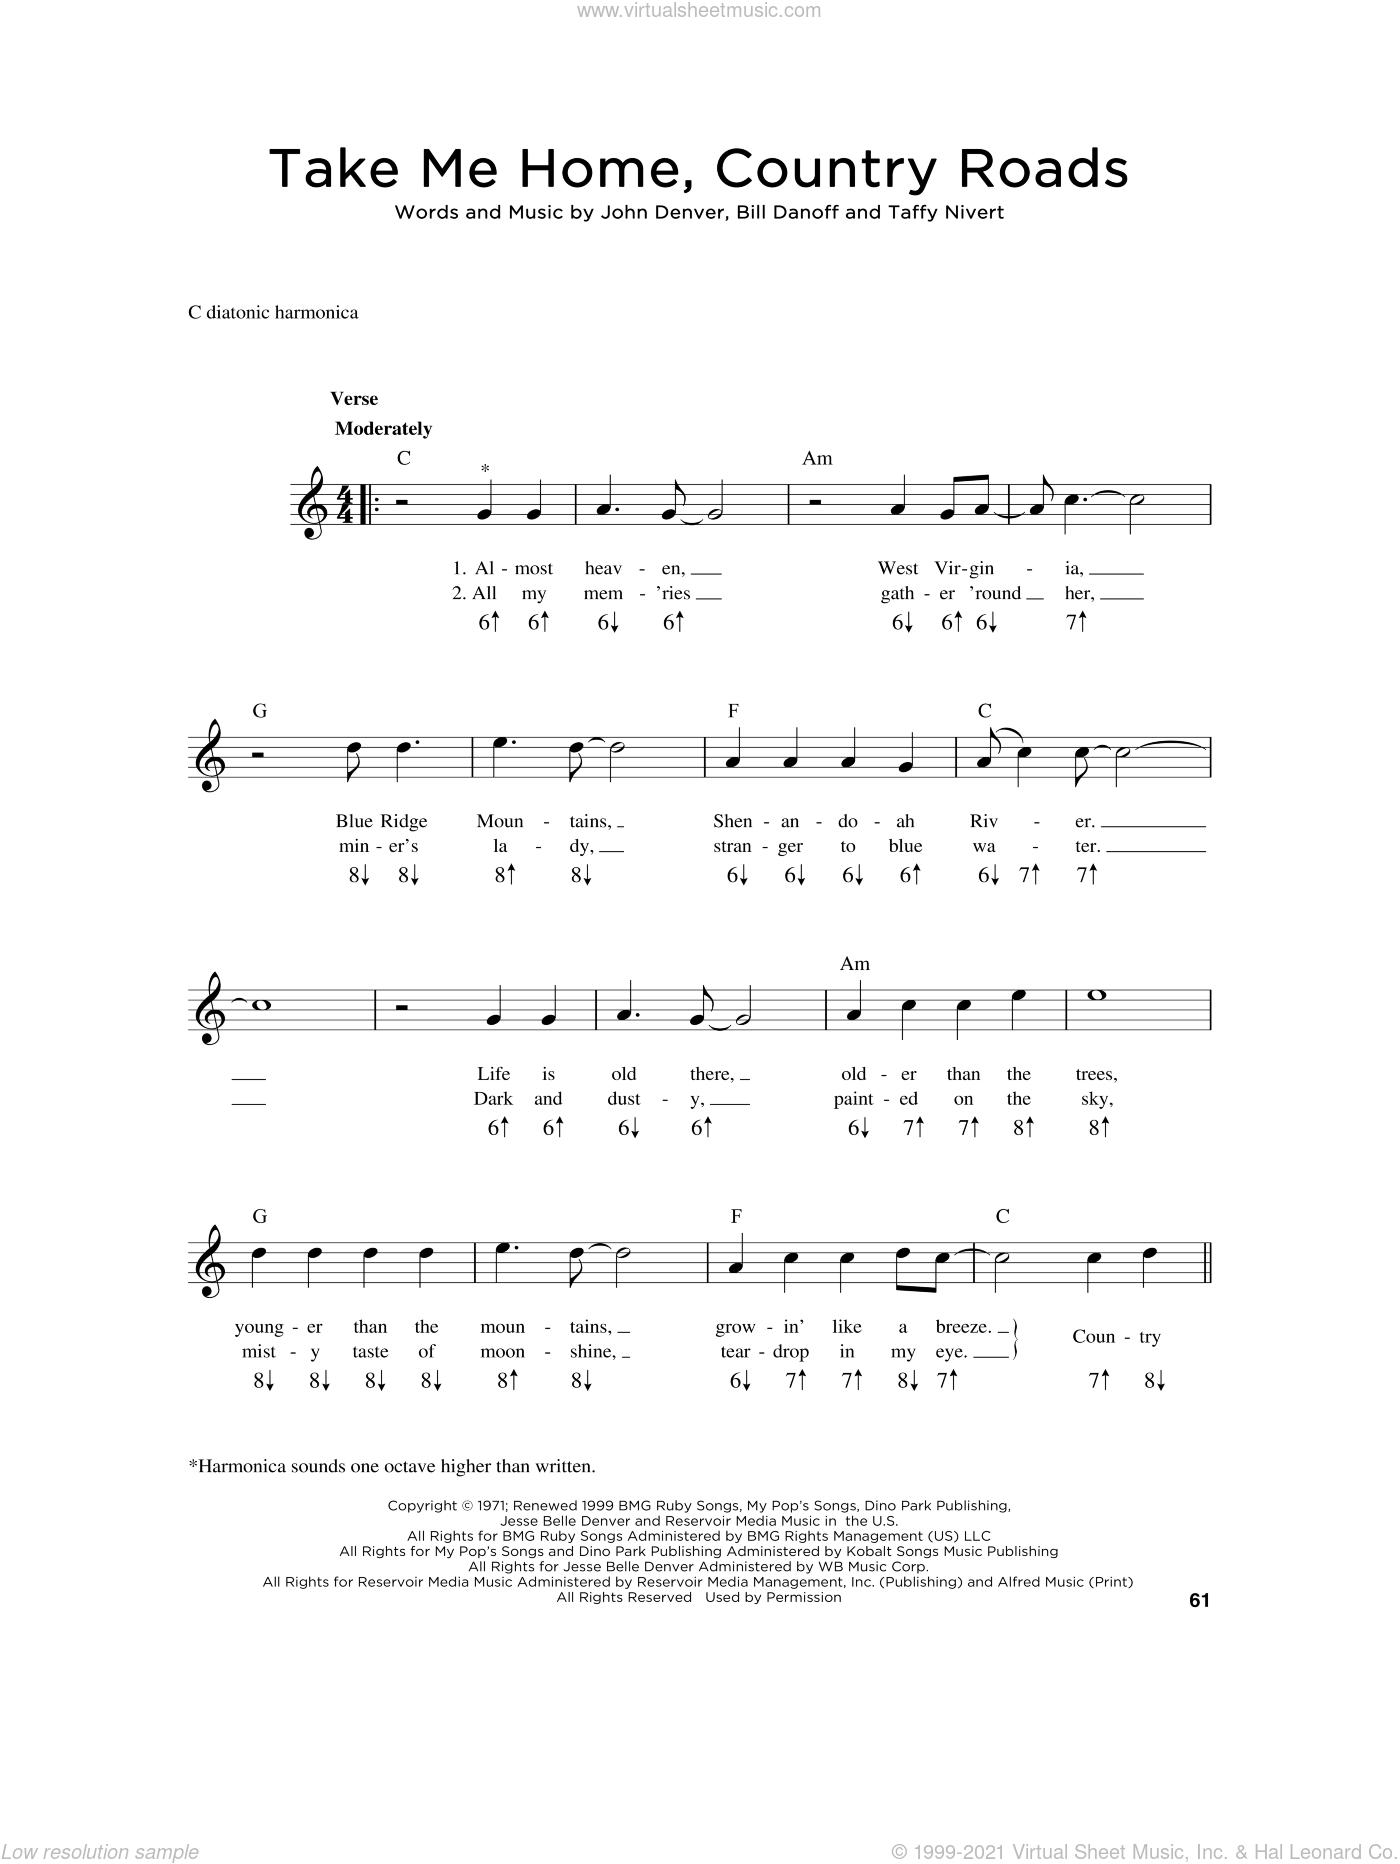 Take Me Home, Country Roads sheet music for harmonica solo by John Denver, Bill Danoff and Taffy Nivert, intermediate skill level